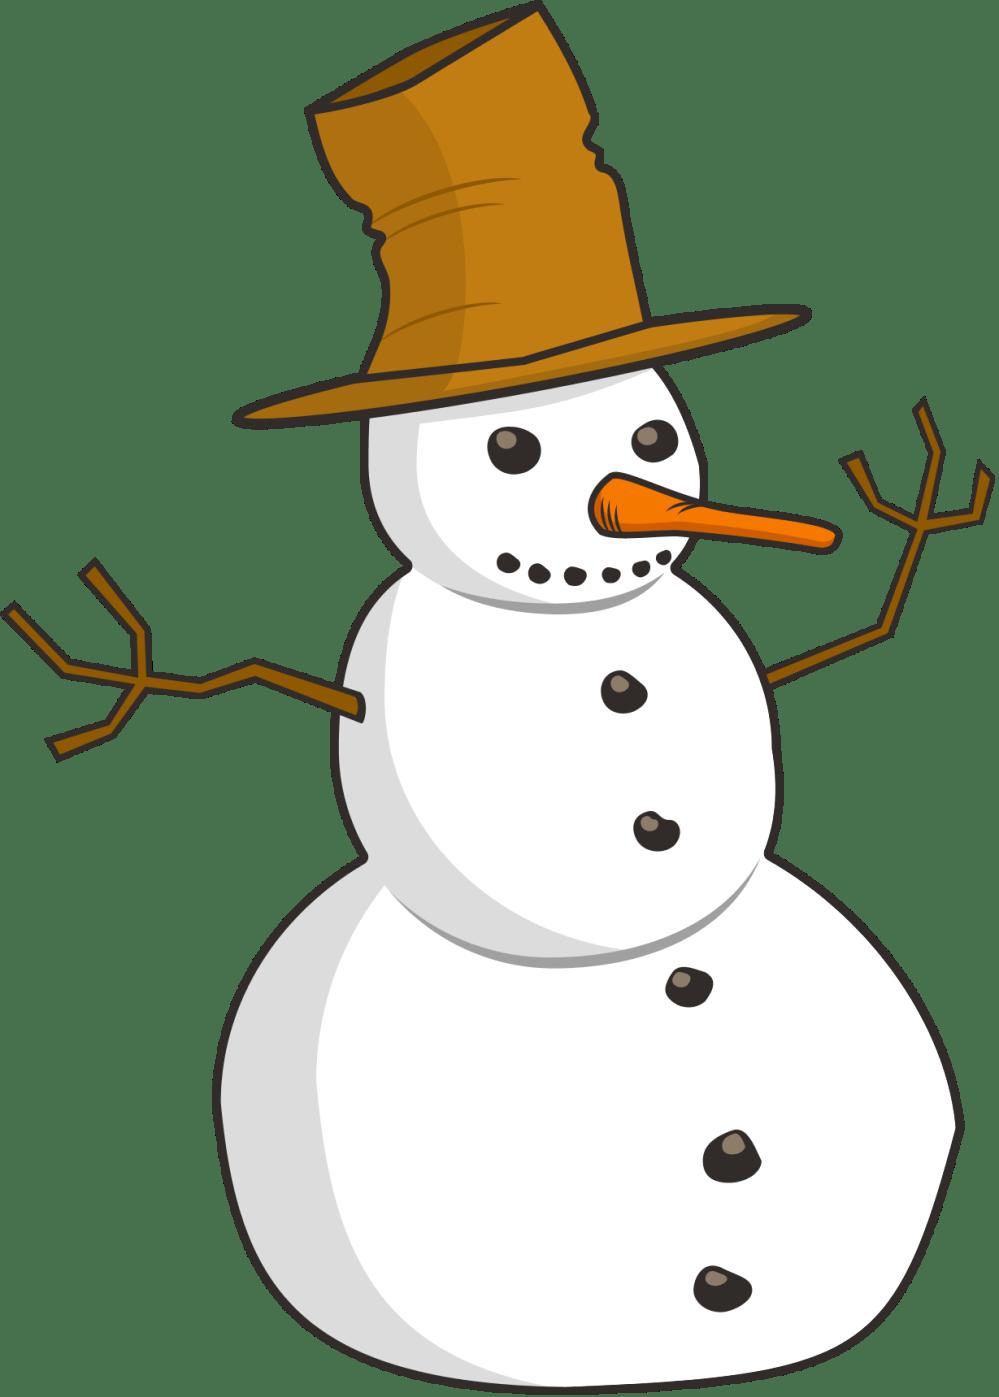 medium resolution of snowman clipart